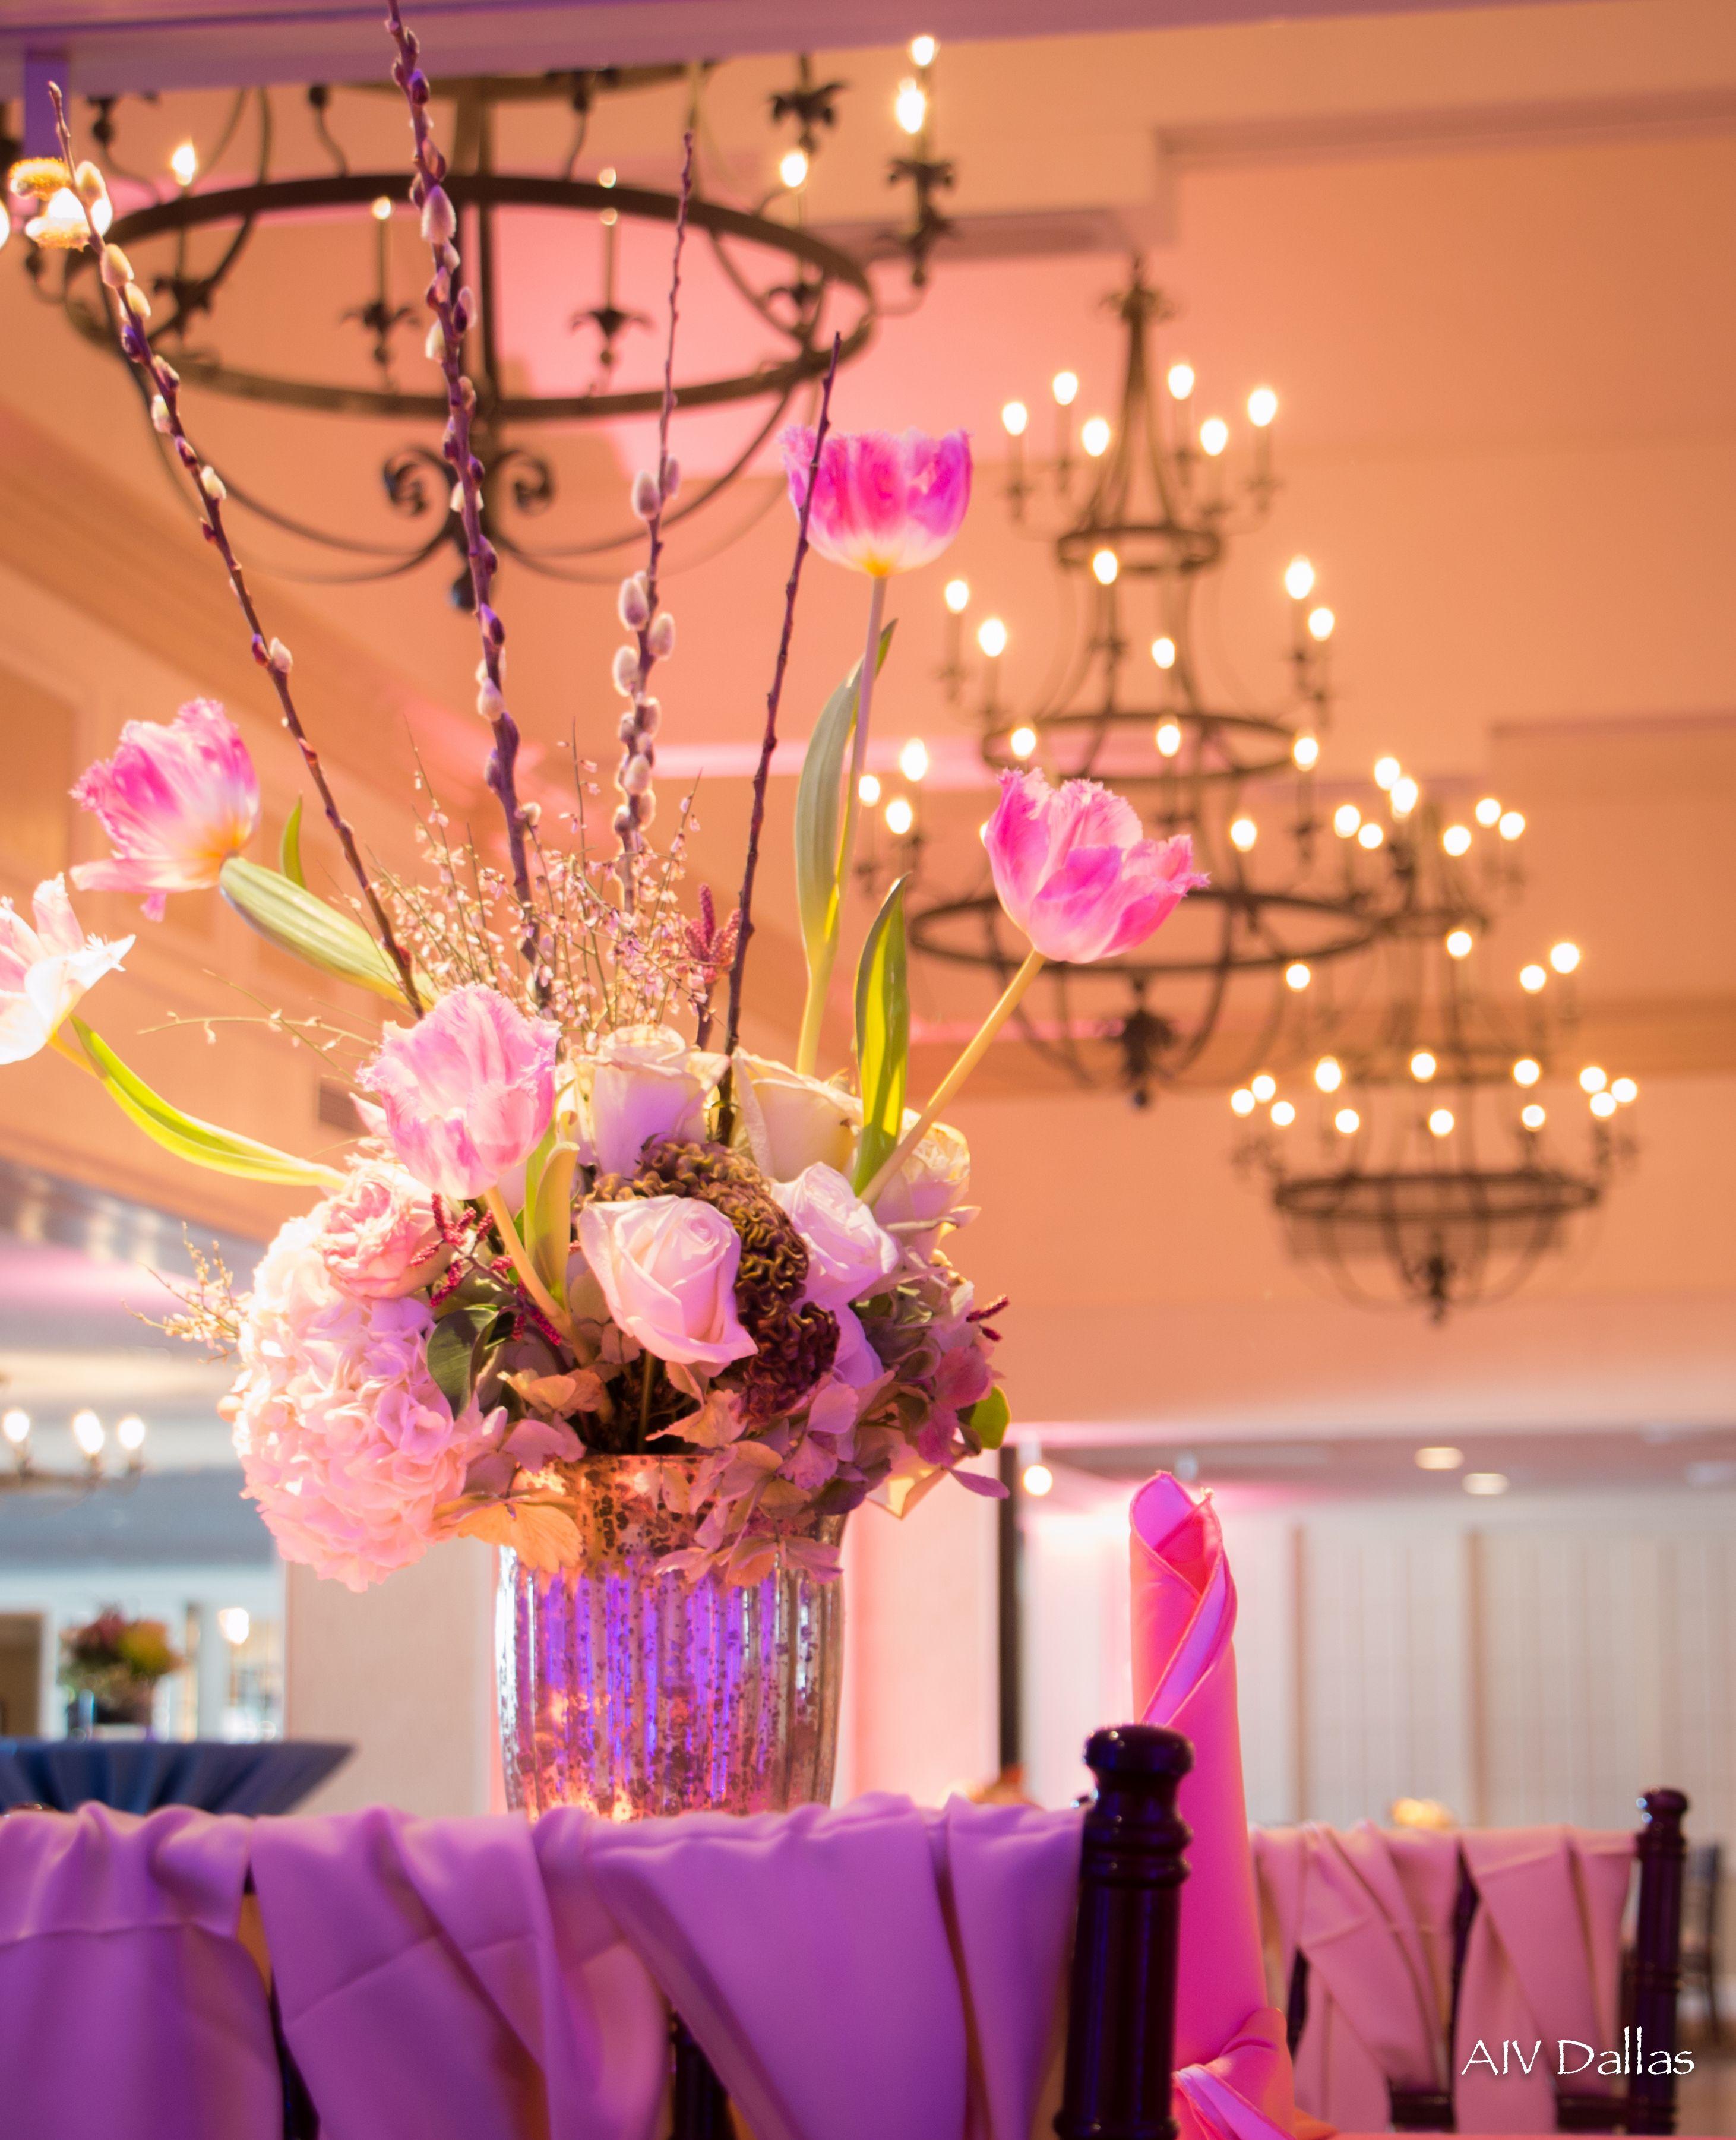 Brookhaven Country Club, Farmers Branch, TX #wedding